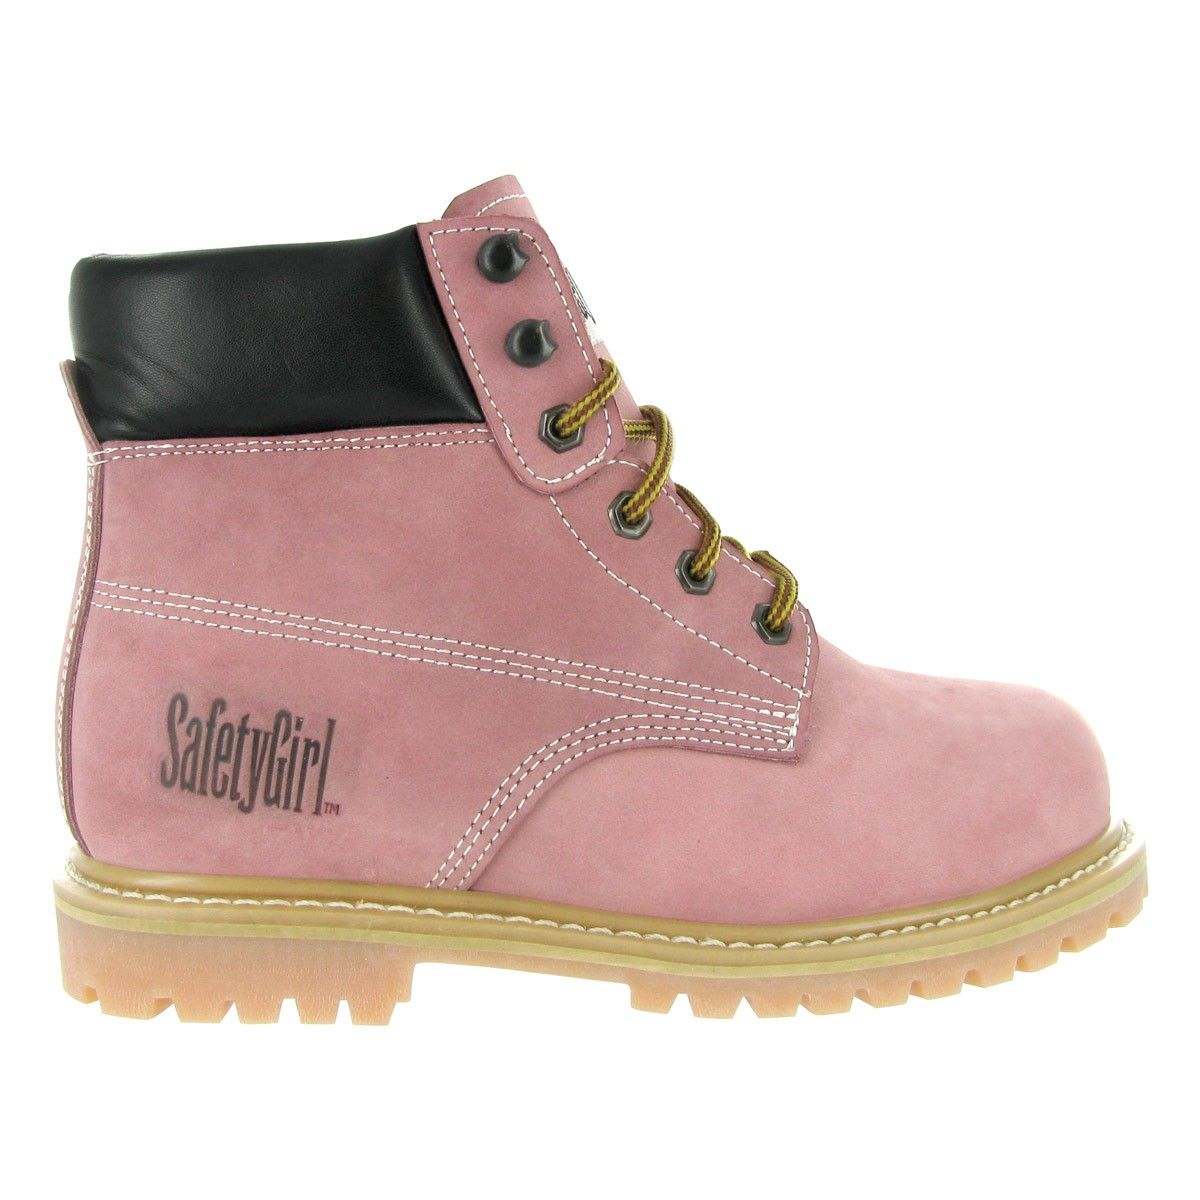 Comfortable steel toe boots